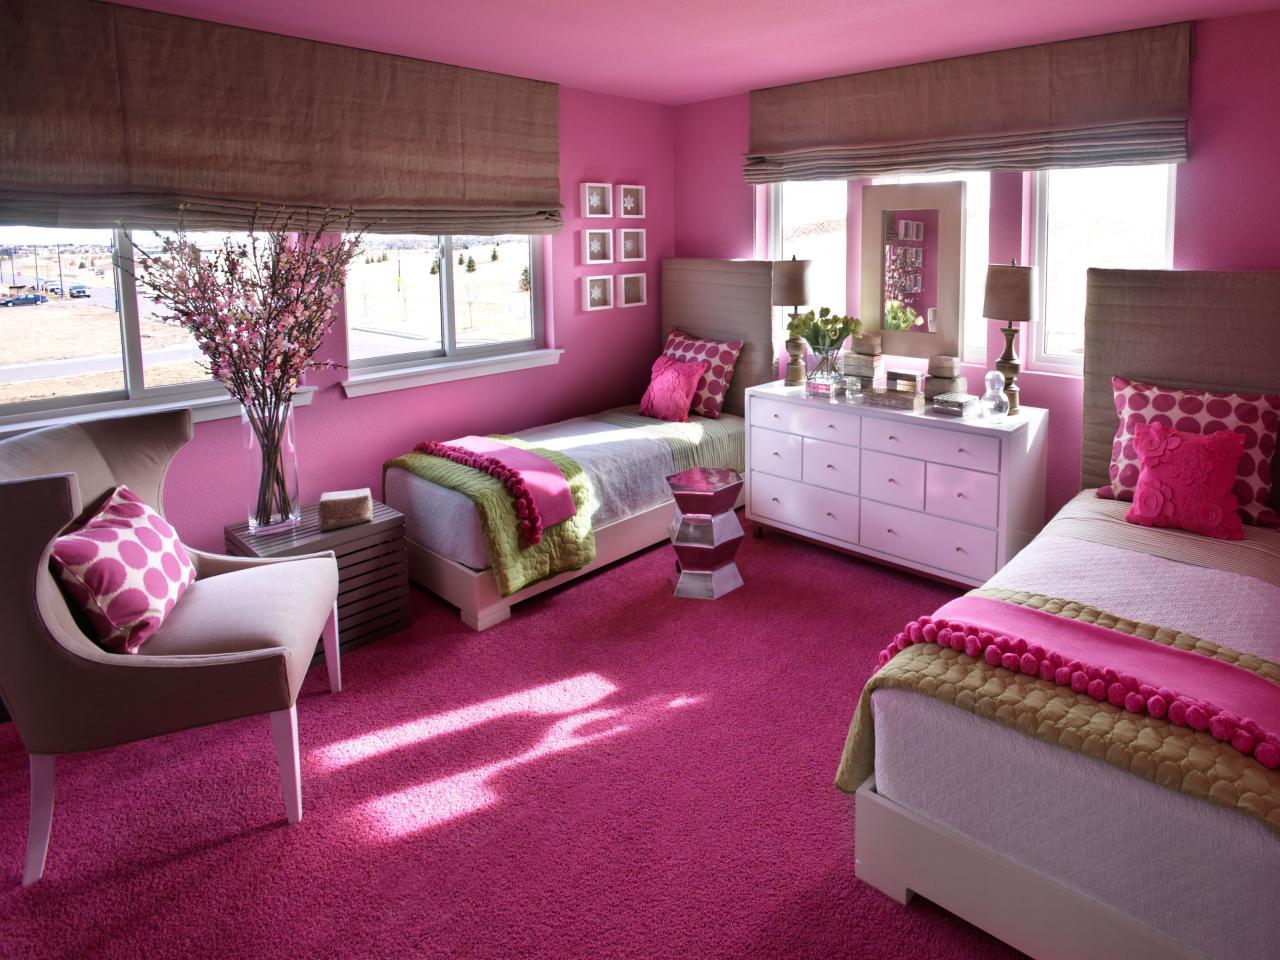 Pilih kombinasi warna yang tepat - Buat Kejutan Manis untuk Si Kecil dengan Memasang Wallpaper Dinding Hello Kitty -HGTV.com